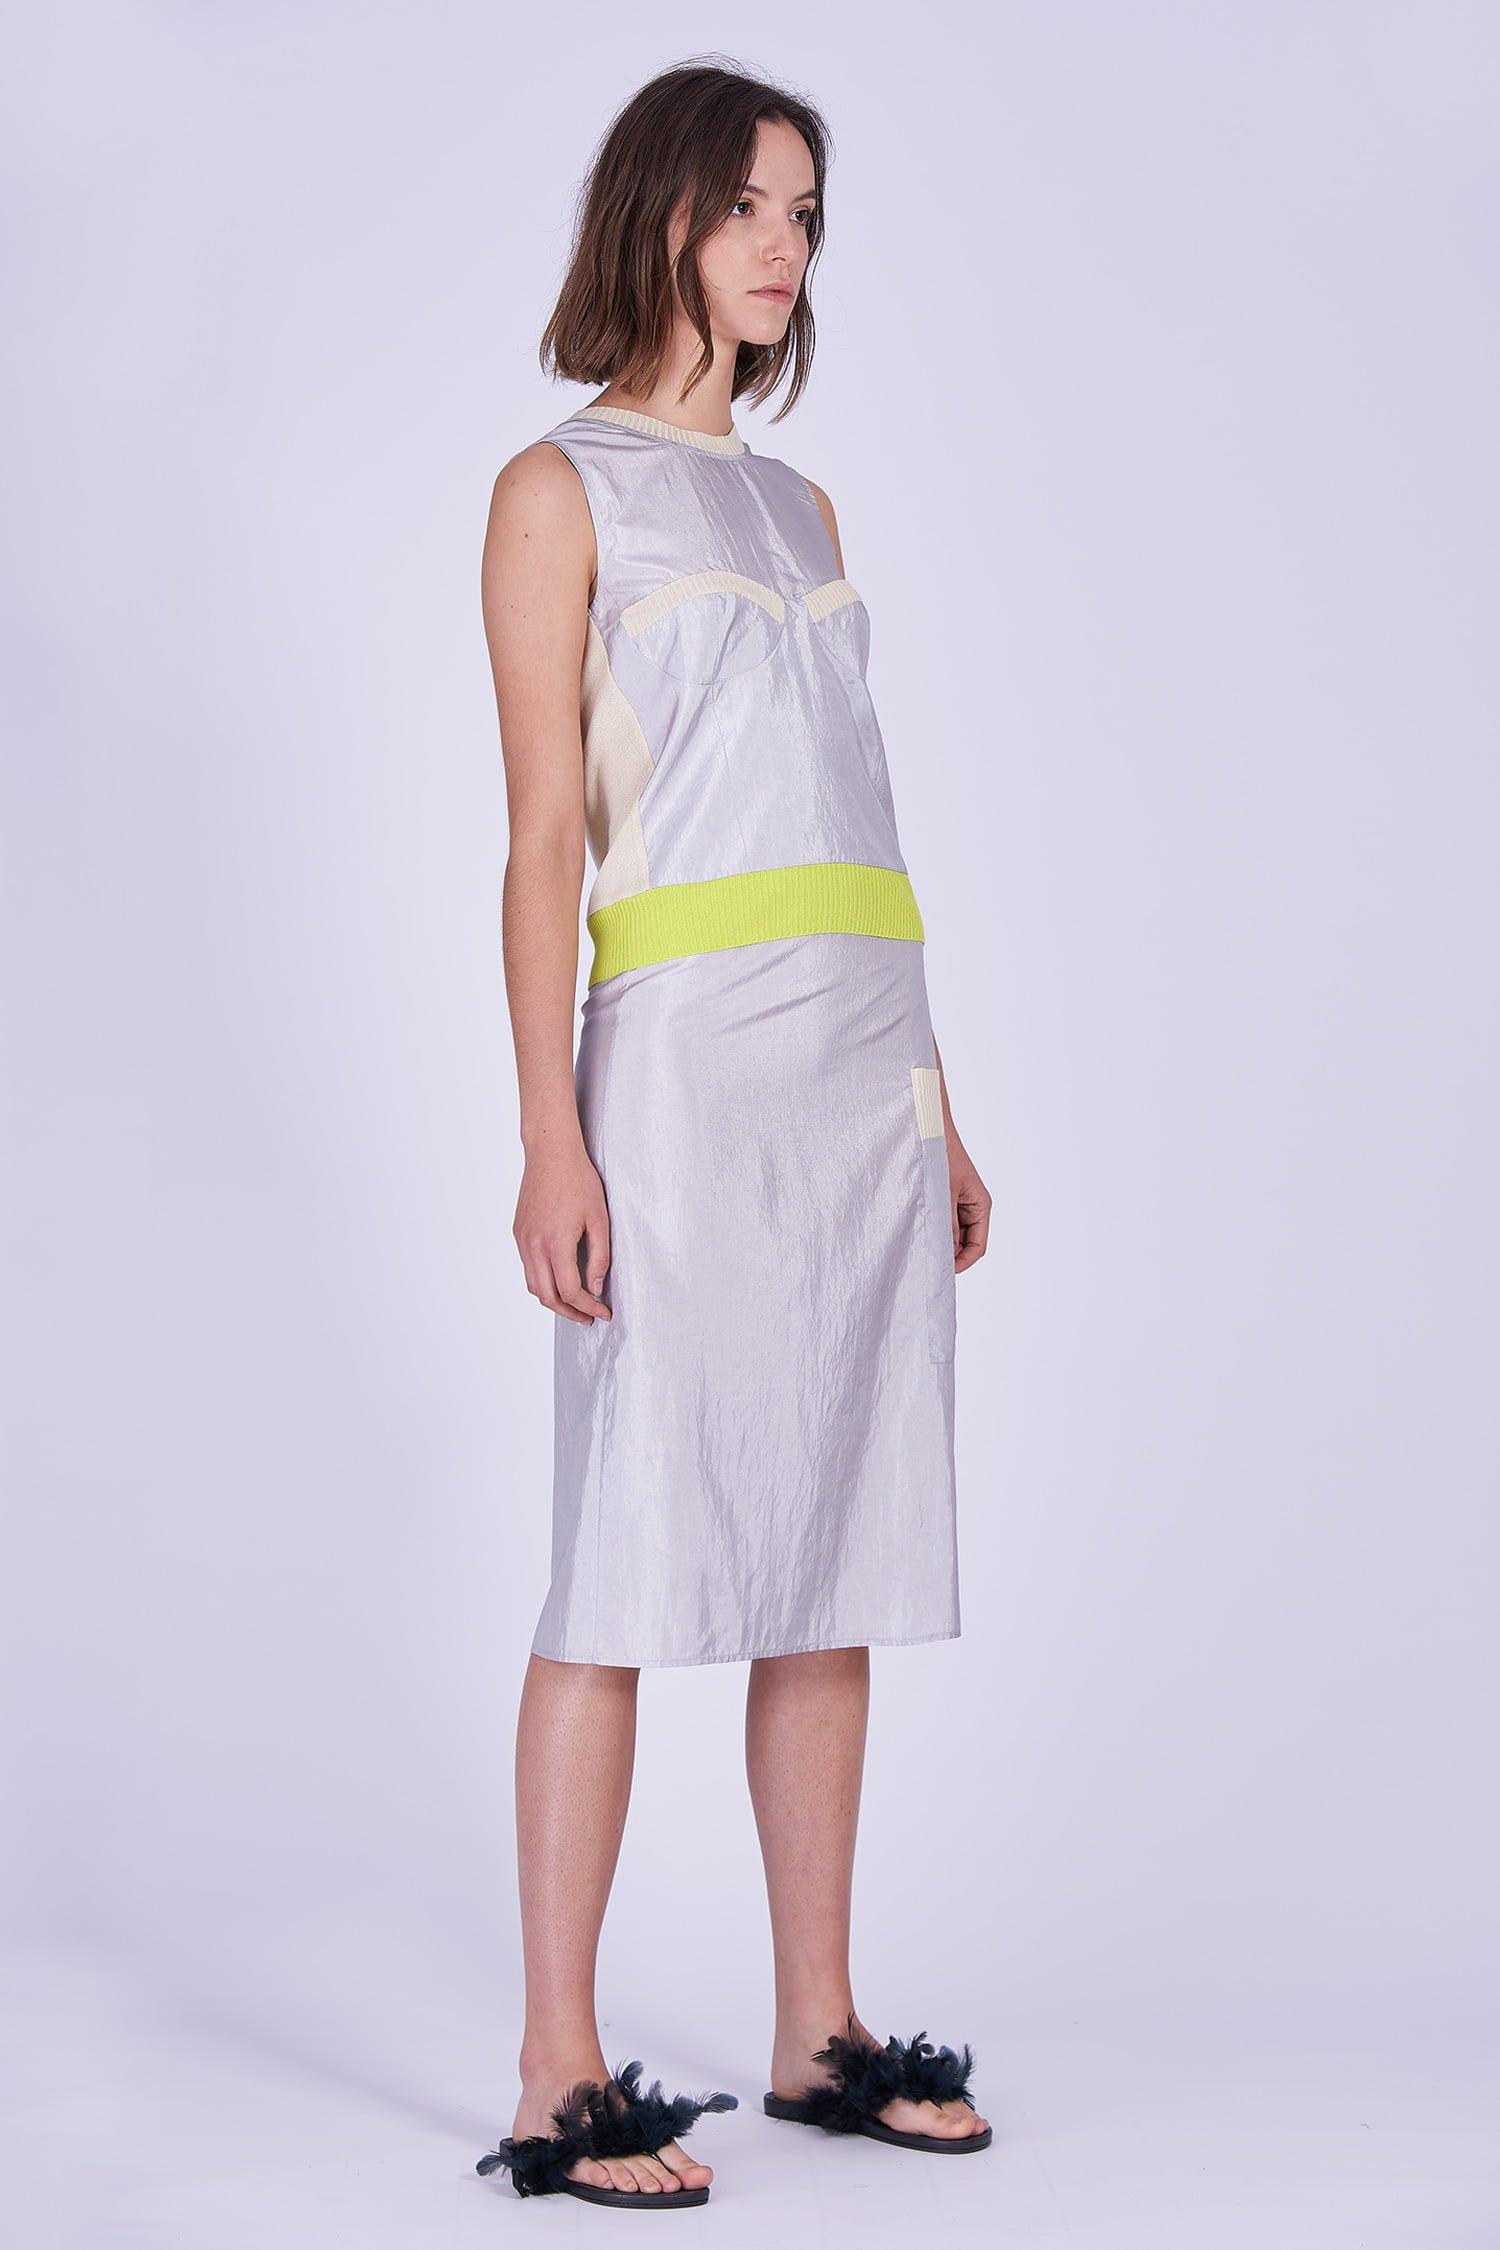 Acephala Ss2020 Silver Bustier Top Midi Skirt Srebrny Gorsetowy Srebrna Spodnica Front Side